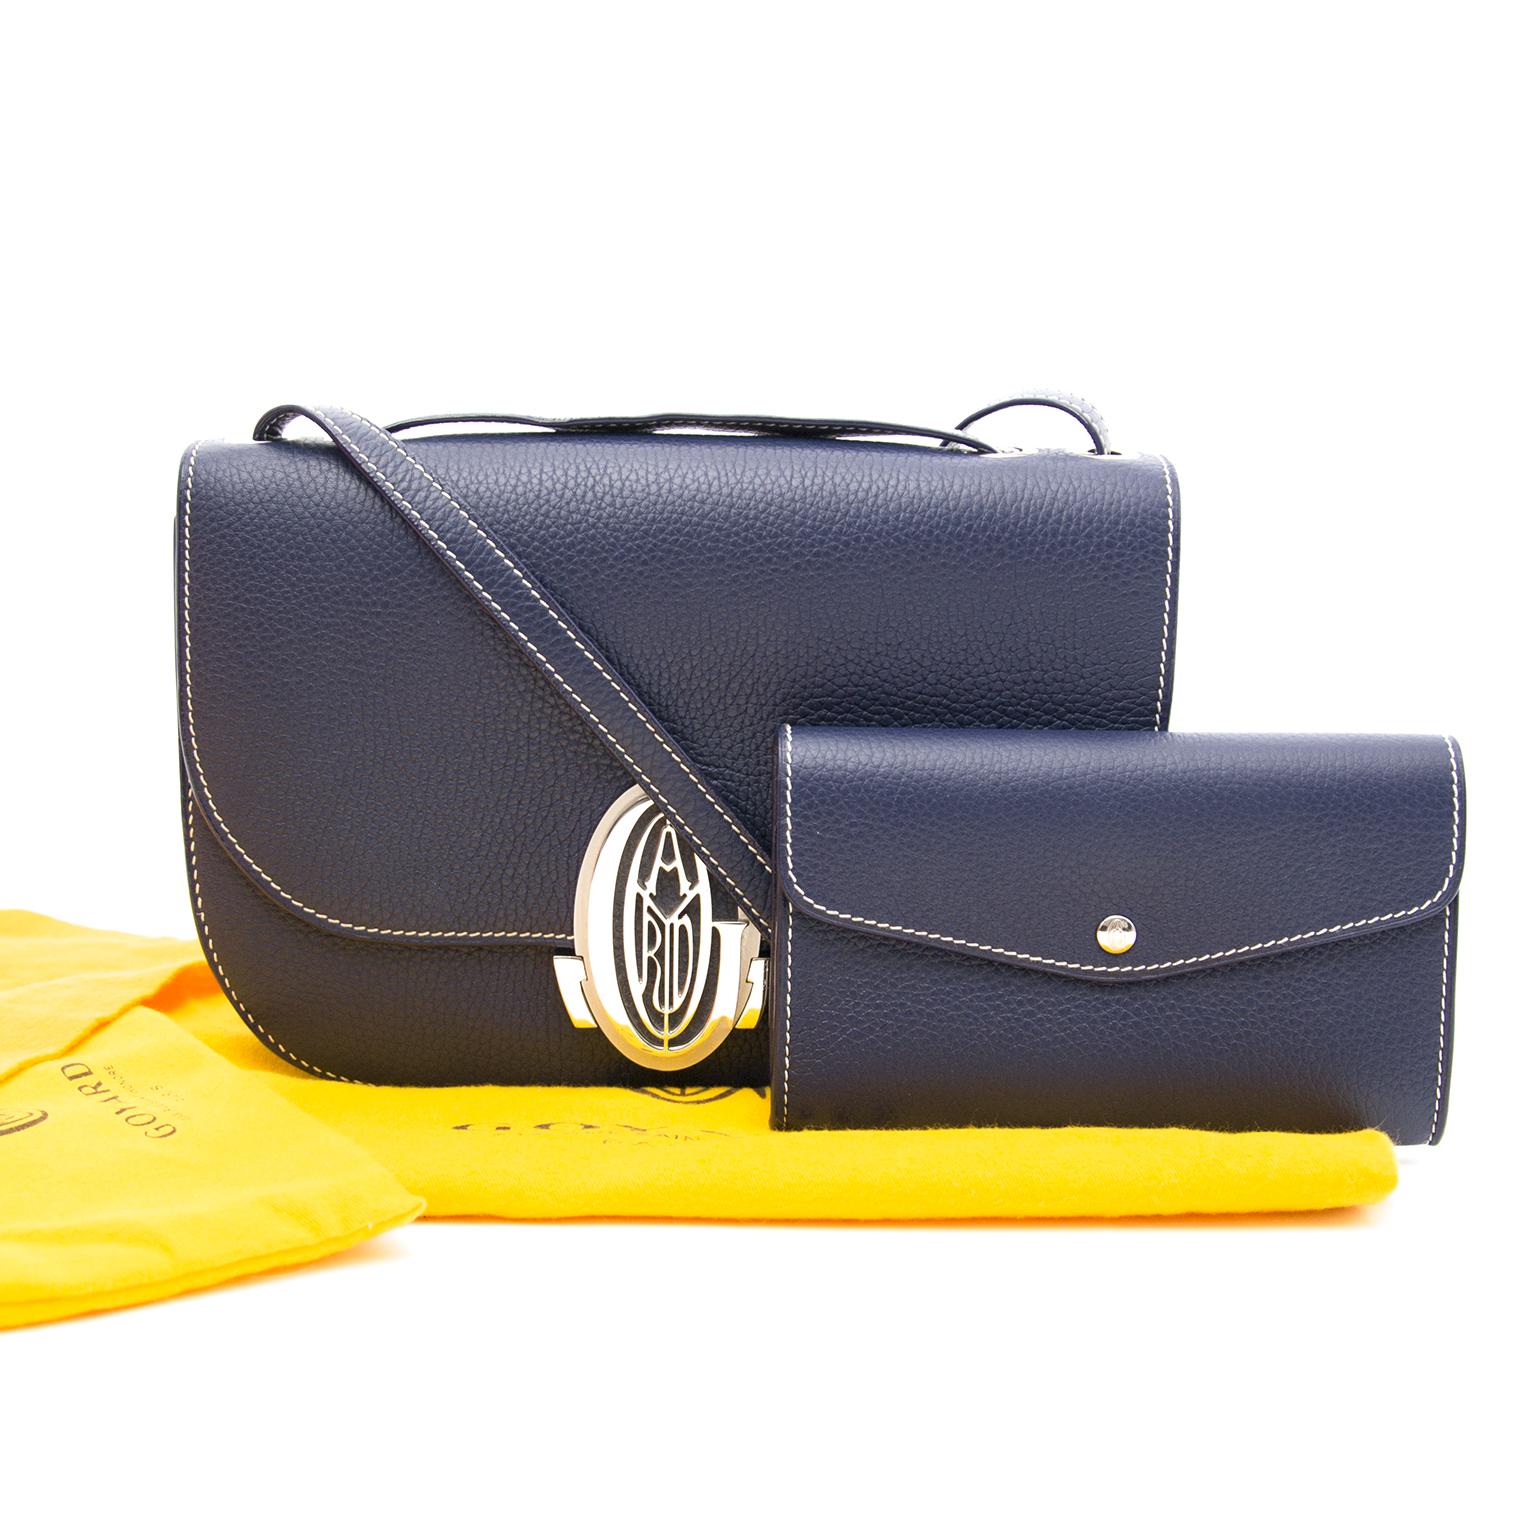 9d722e86f73 lancel handtassen antwerpen online